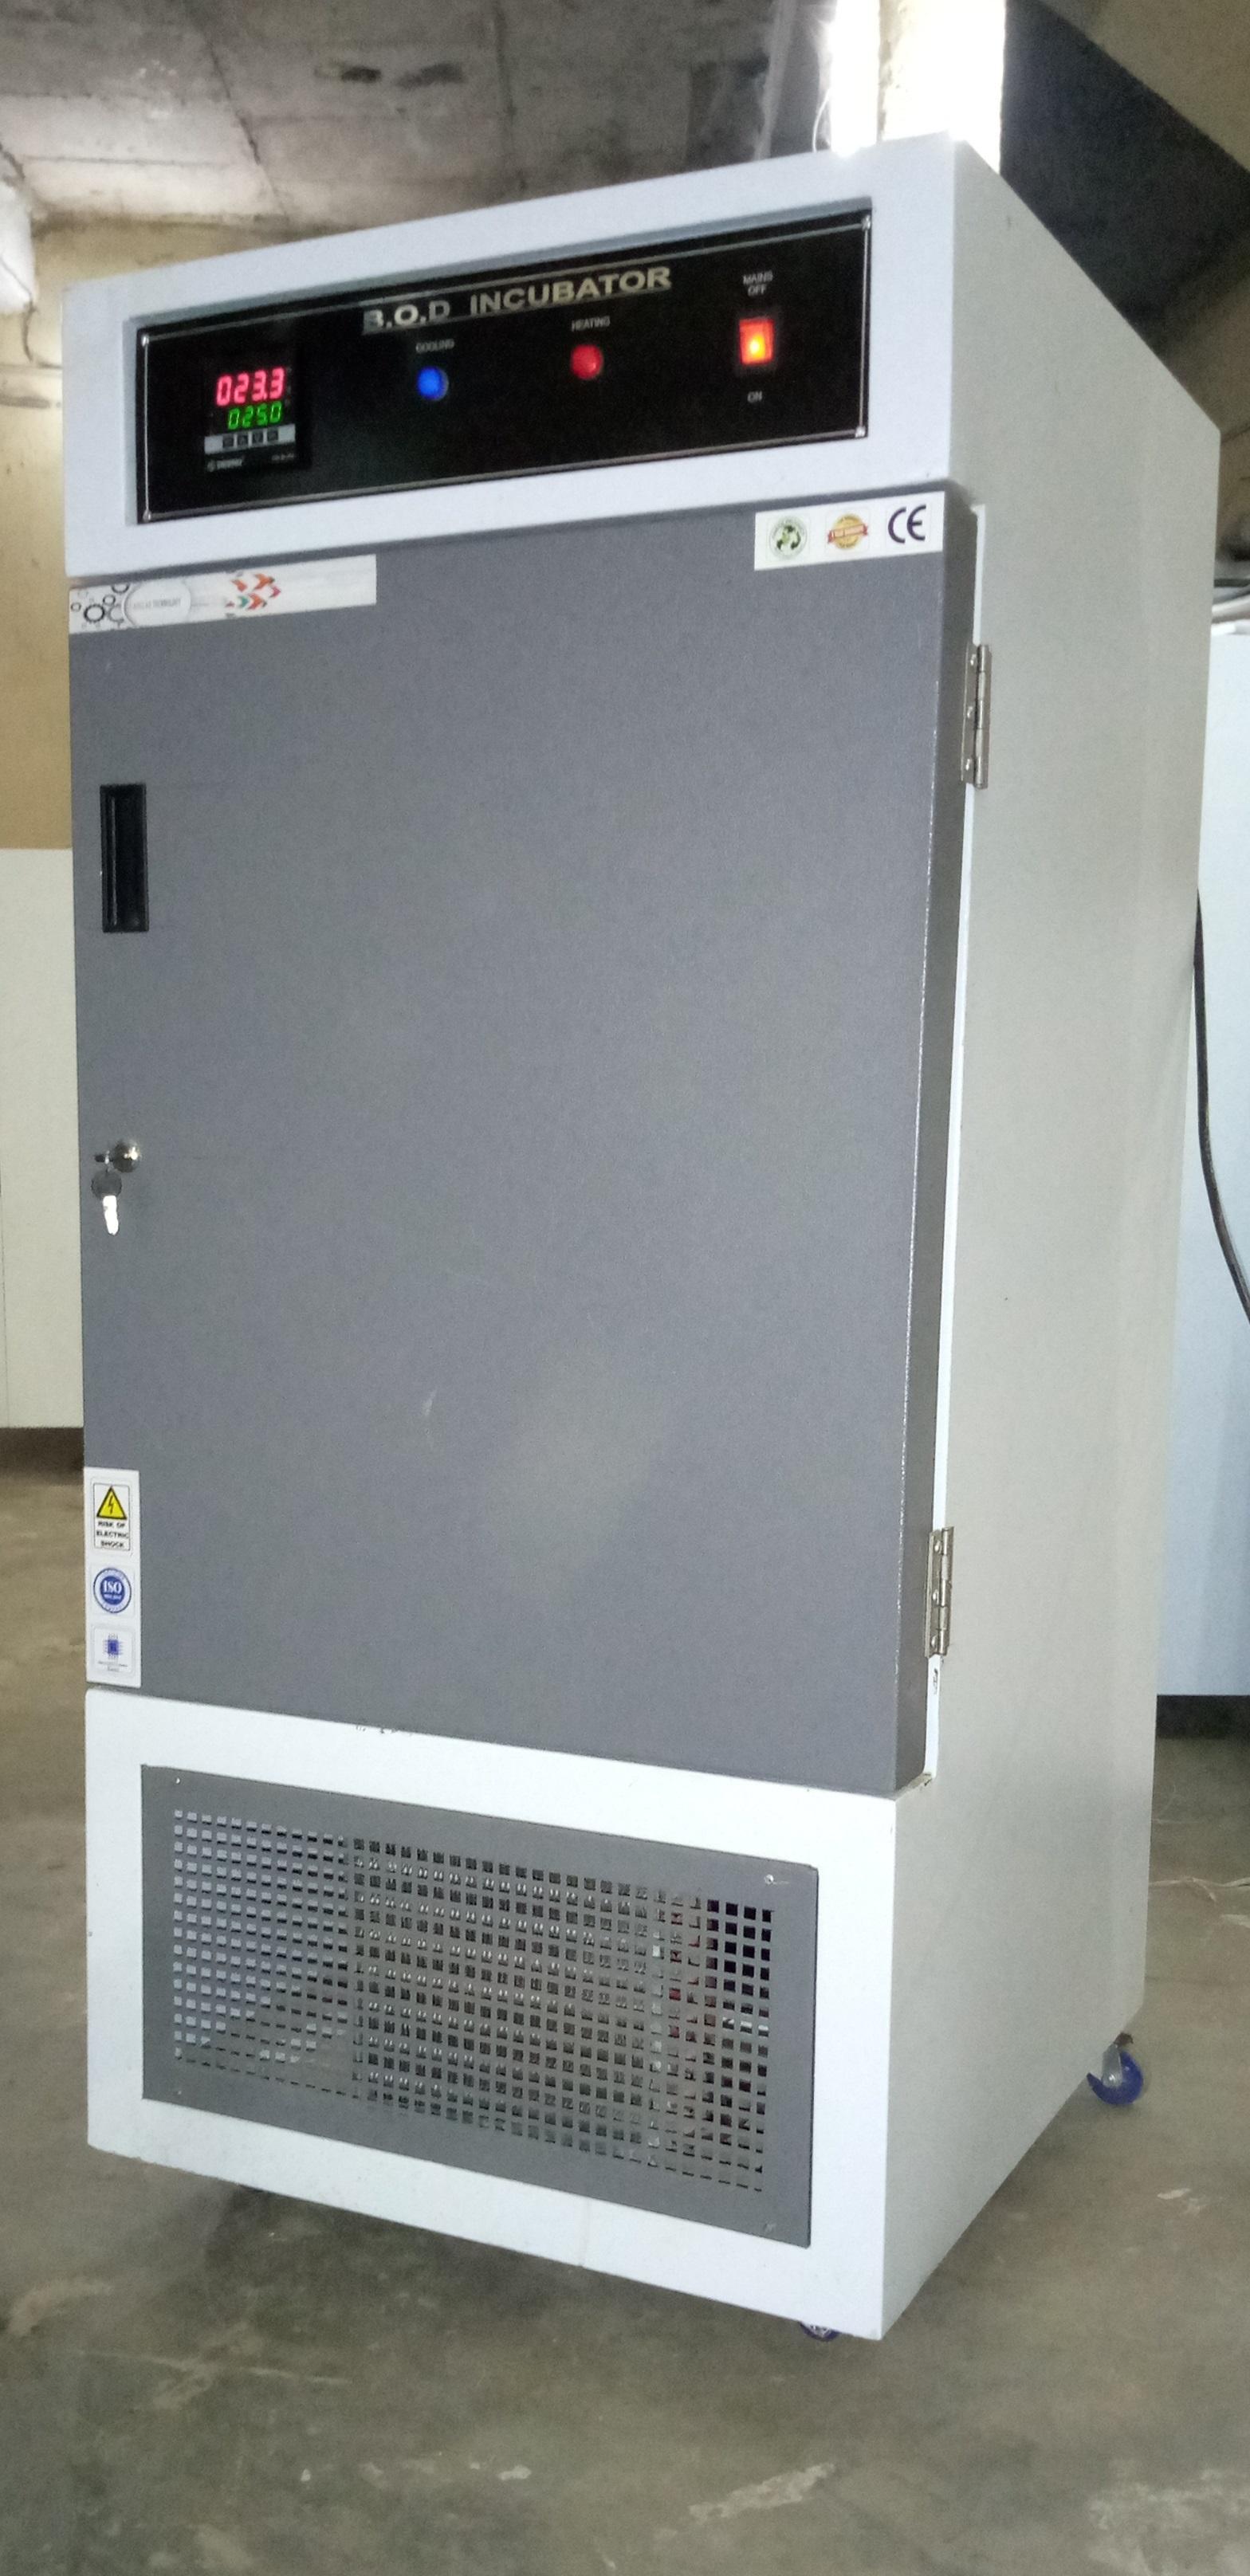 BOD Incubator (Biochemical Oxygen Demand